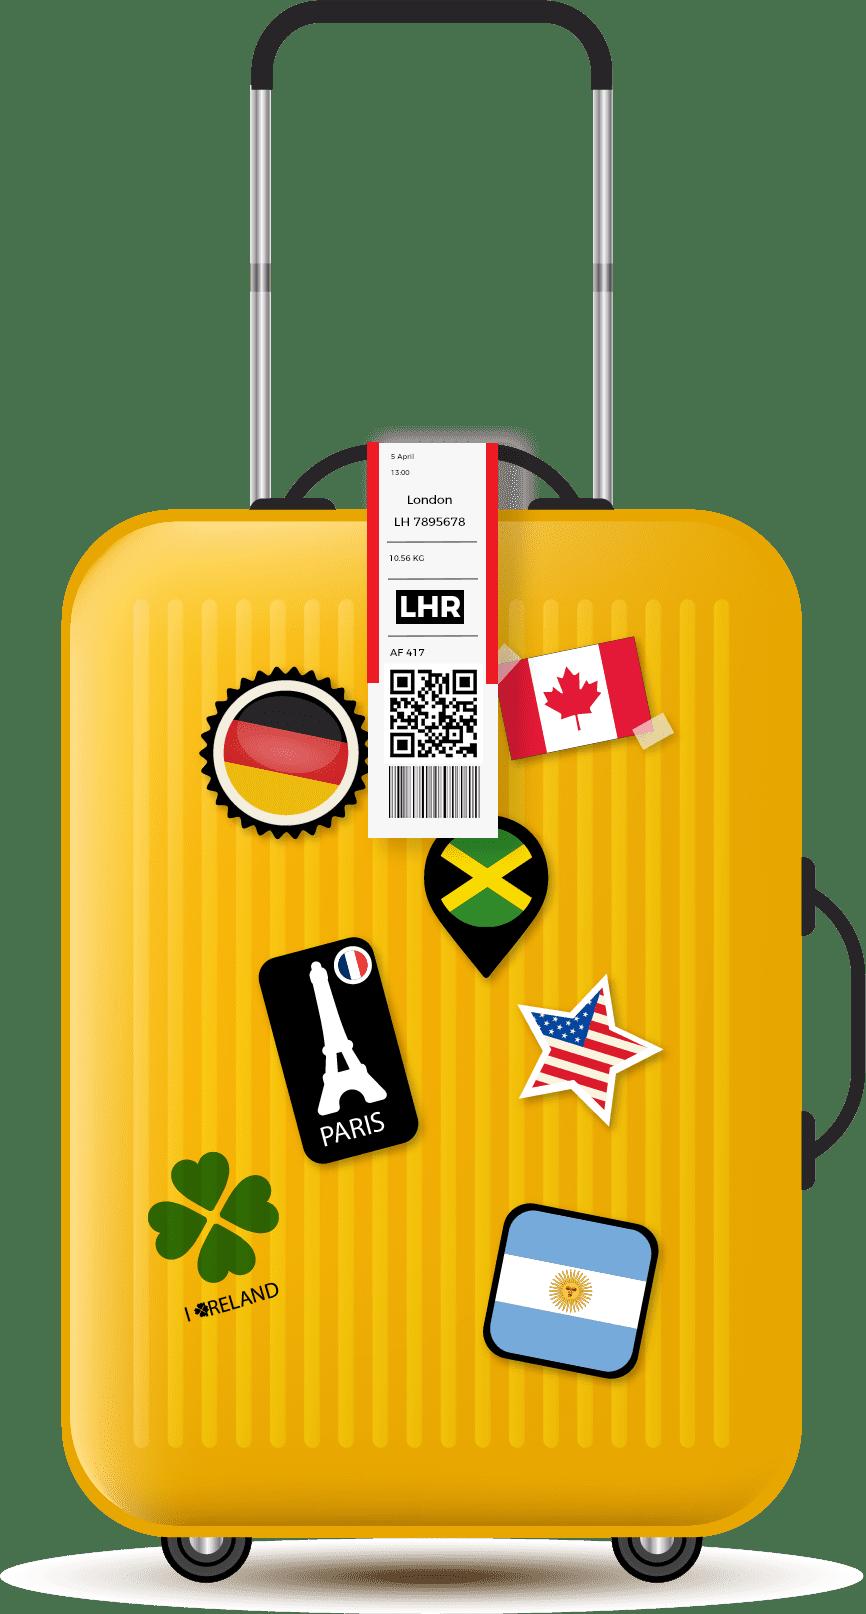 Airline Label and Sticker Printing | Label Printing | Mega Label